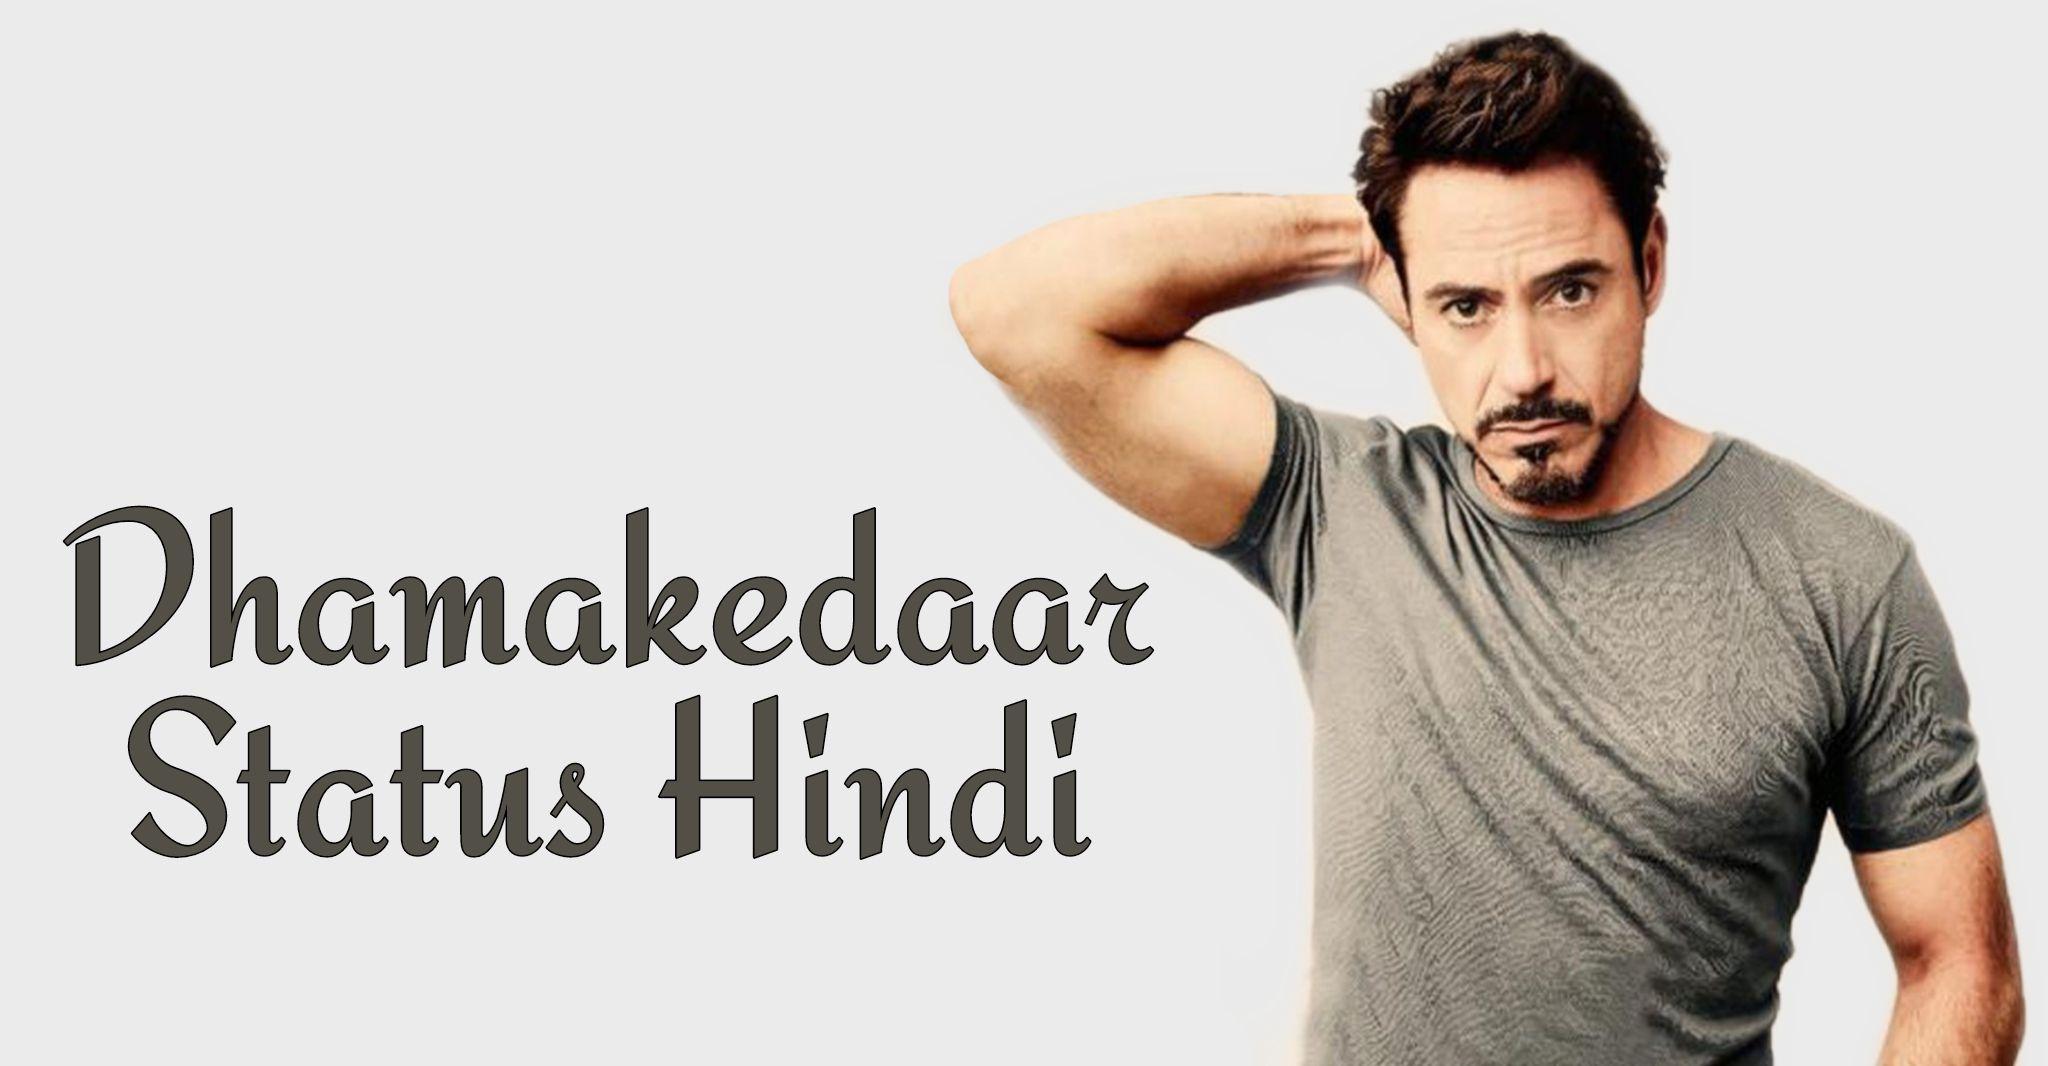 धमाकेदार स्टेटस हिन्दी, धमाकेदार स्टेटस Facebook, Dhamakedaar Status Hindi, Dhamakedaar Status Attitude